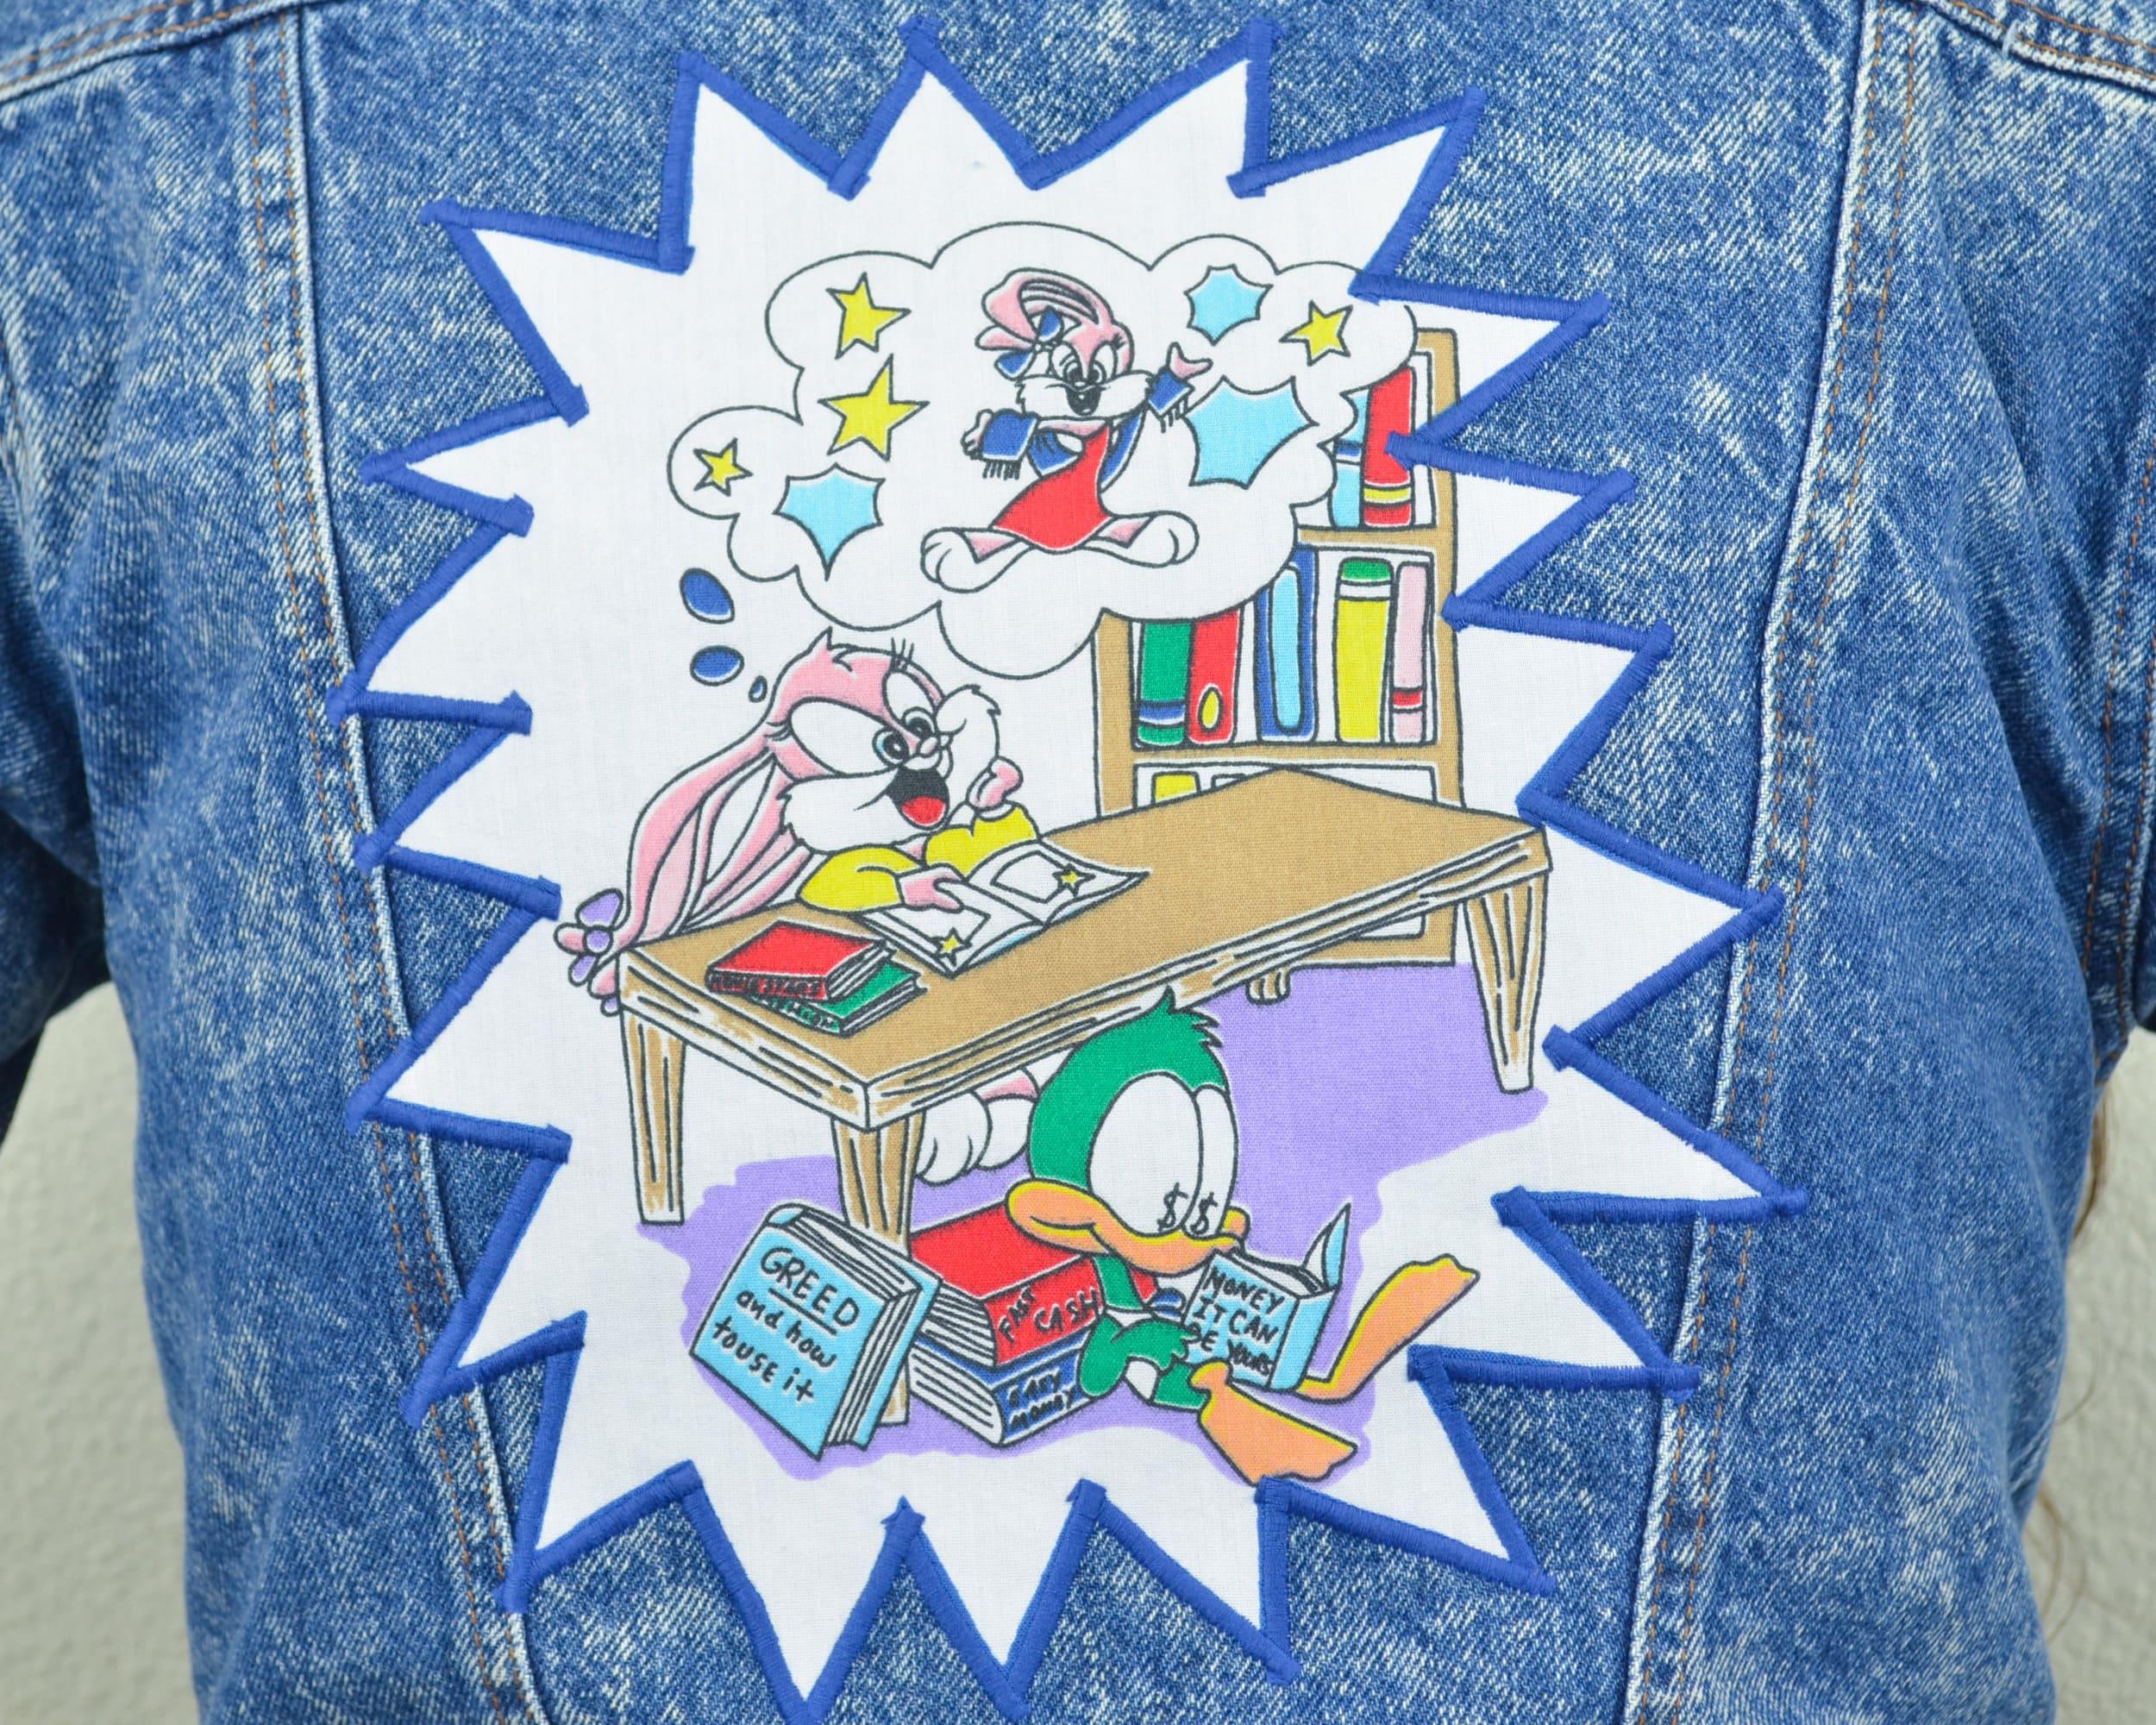 Animaniacs Elmyra Duff tiny toon adventures distressed denim jacket acid wash jean jacket with  back patch - xs s m